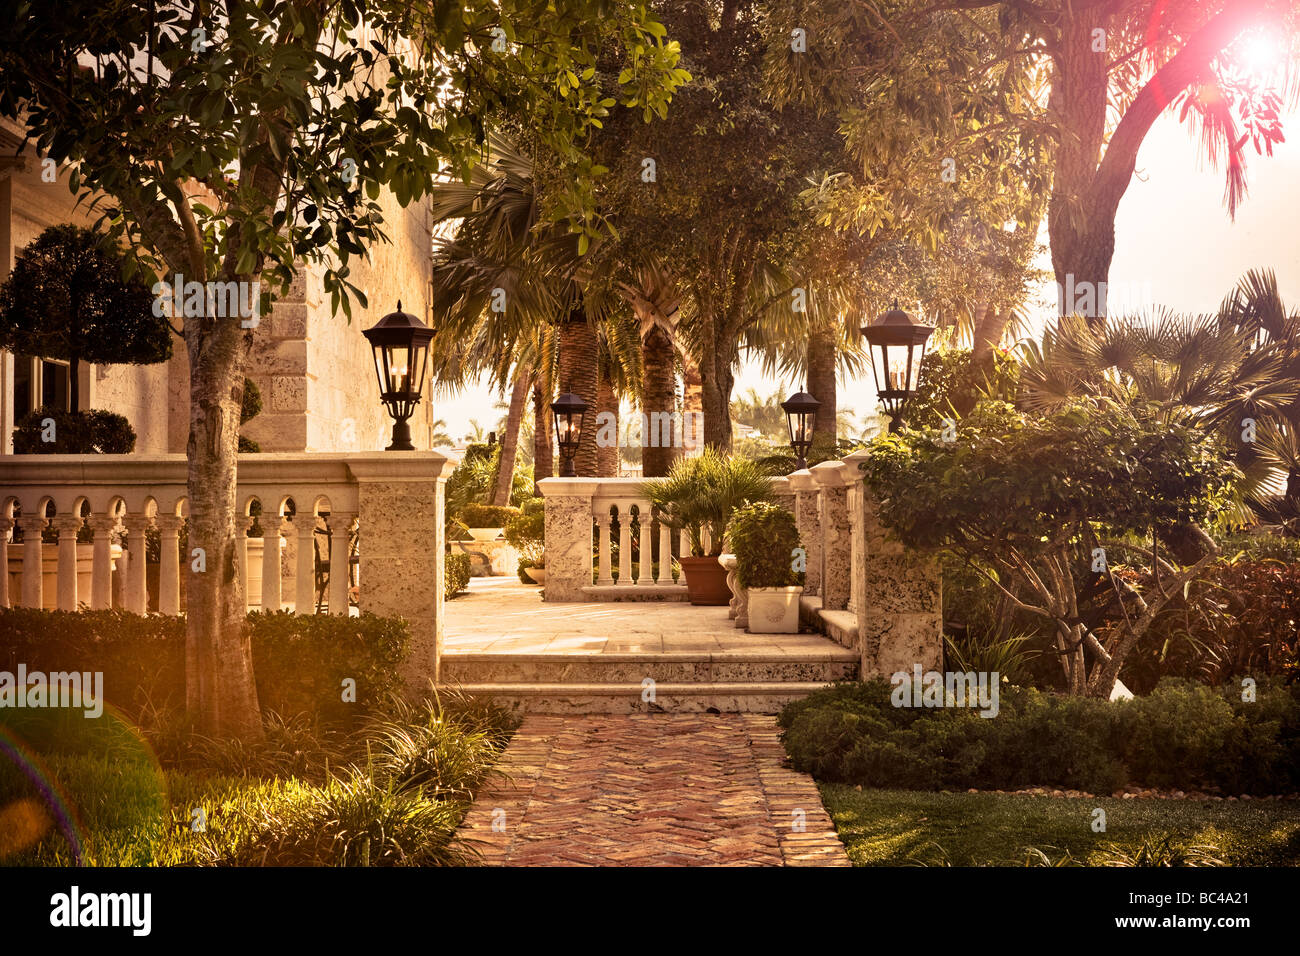 patio stockfotos patio bilder alamy. Black Bedroom Furniture Sets. Home Design Ideas